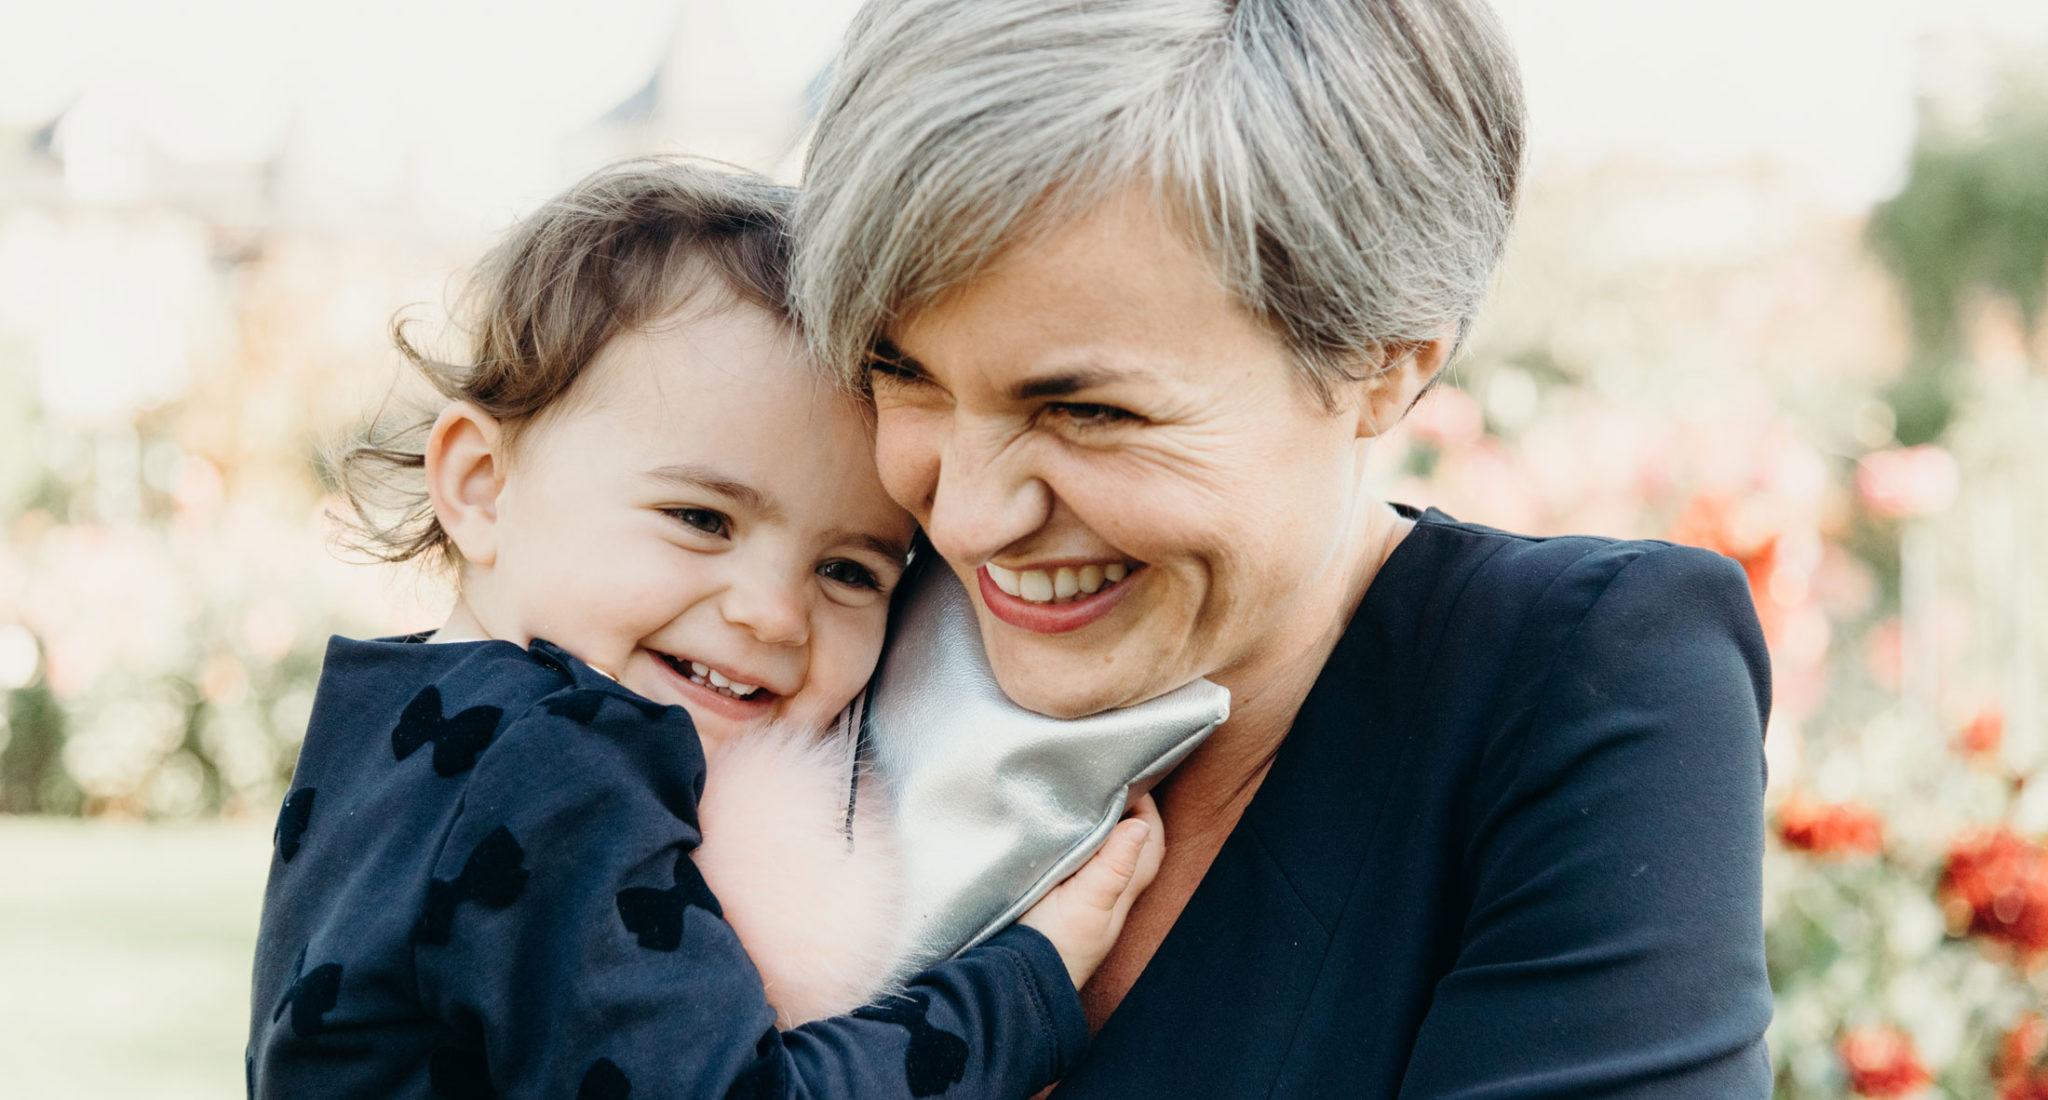 une maman avec sa fille font un gros calin en souriant